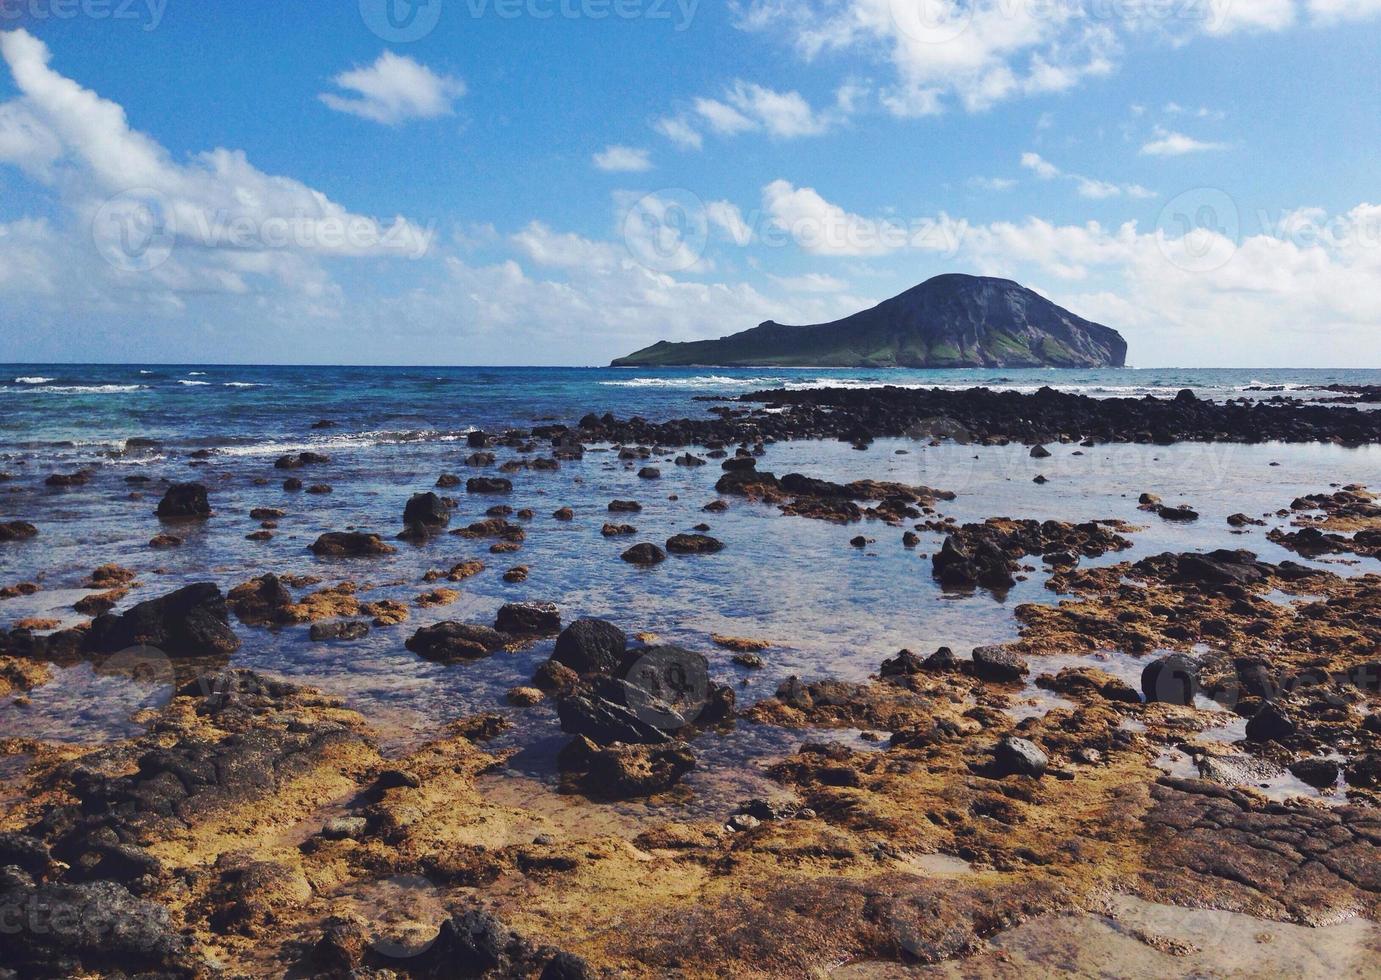 Felsstrand mit Meer und Kanincheninsel Waimanalo Hawaii foto